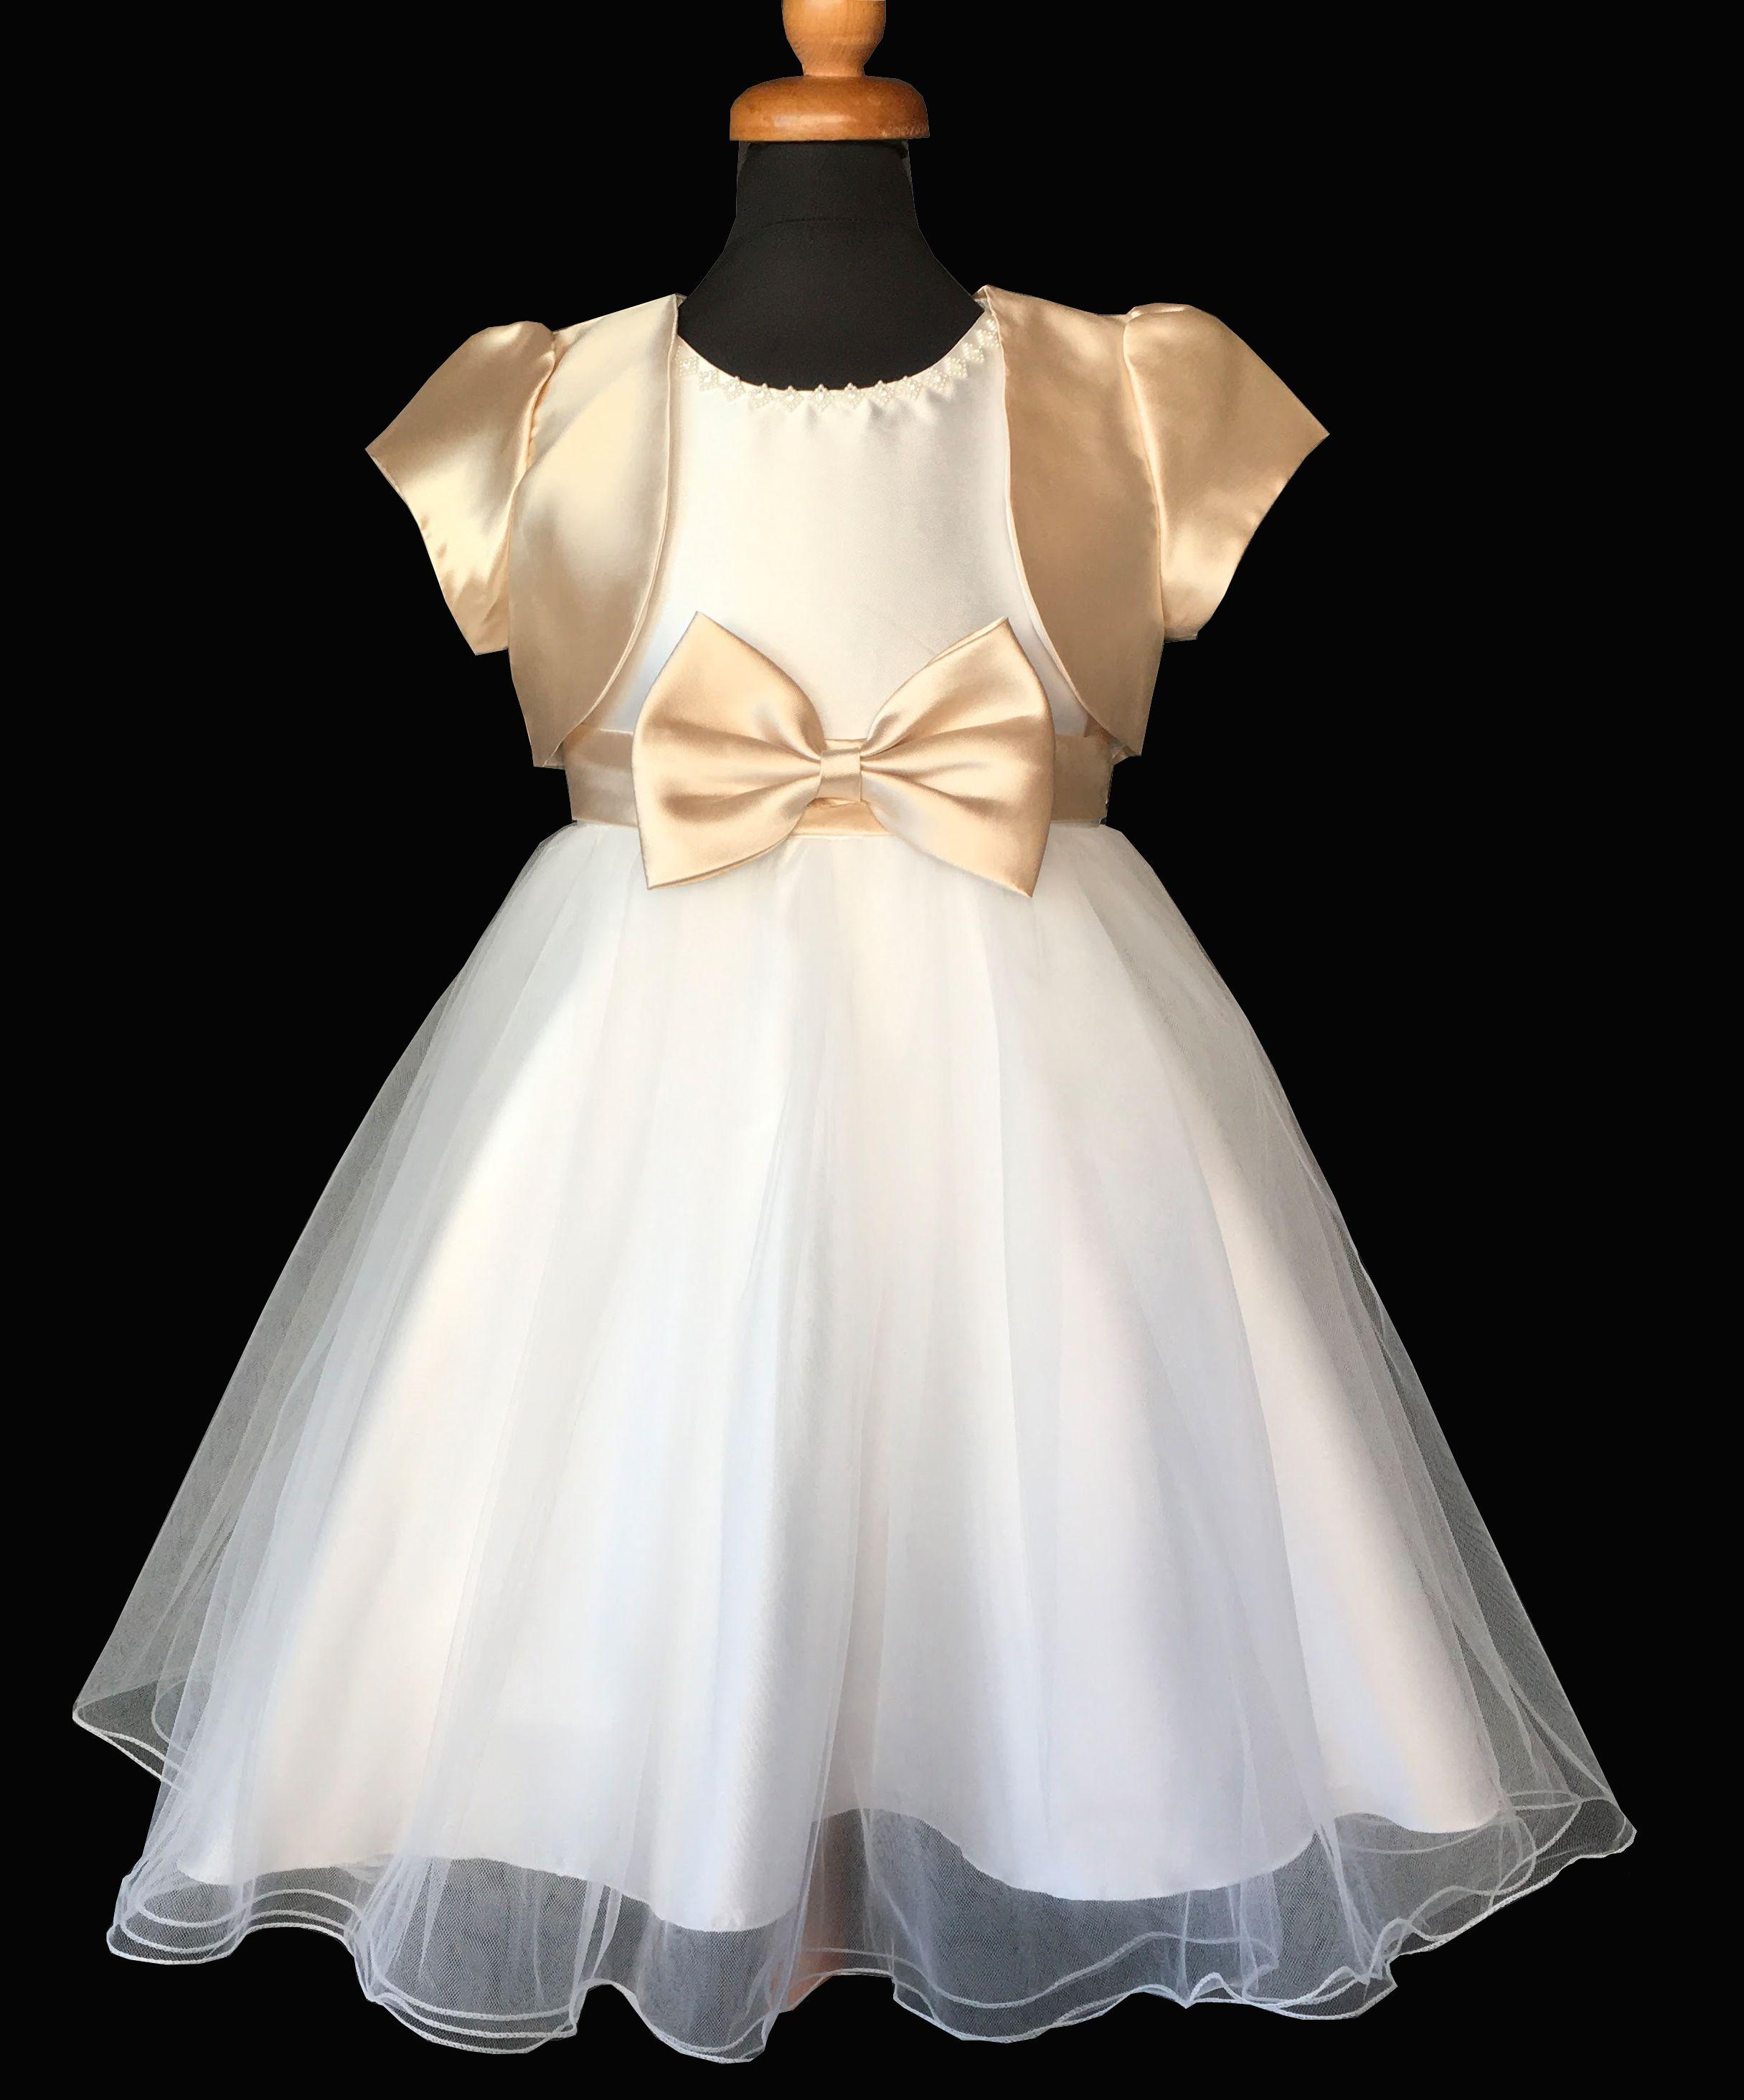 cd338c61d87 Παιδικό Φόρεμα σε Λευκό και Χρυσαφί για Παρανυφάκι, Πάρτυ, Βάπτιση